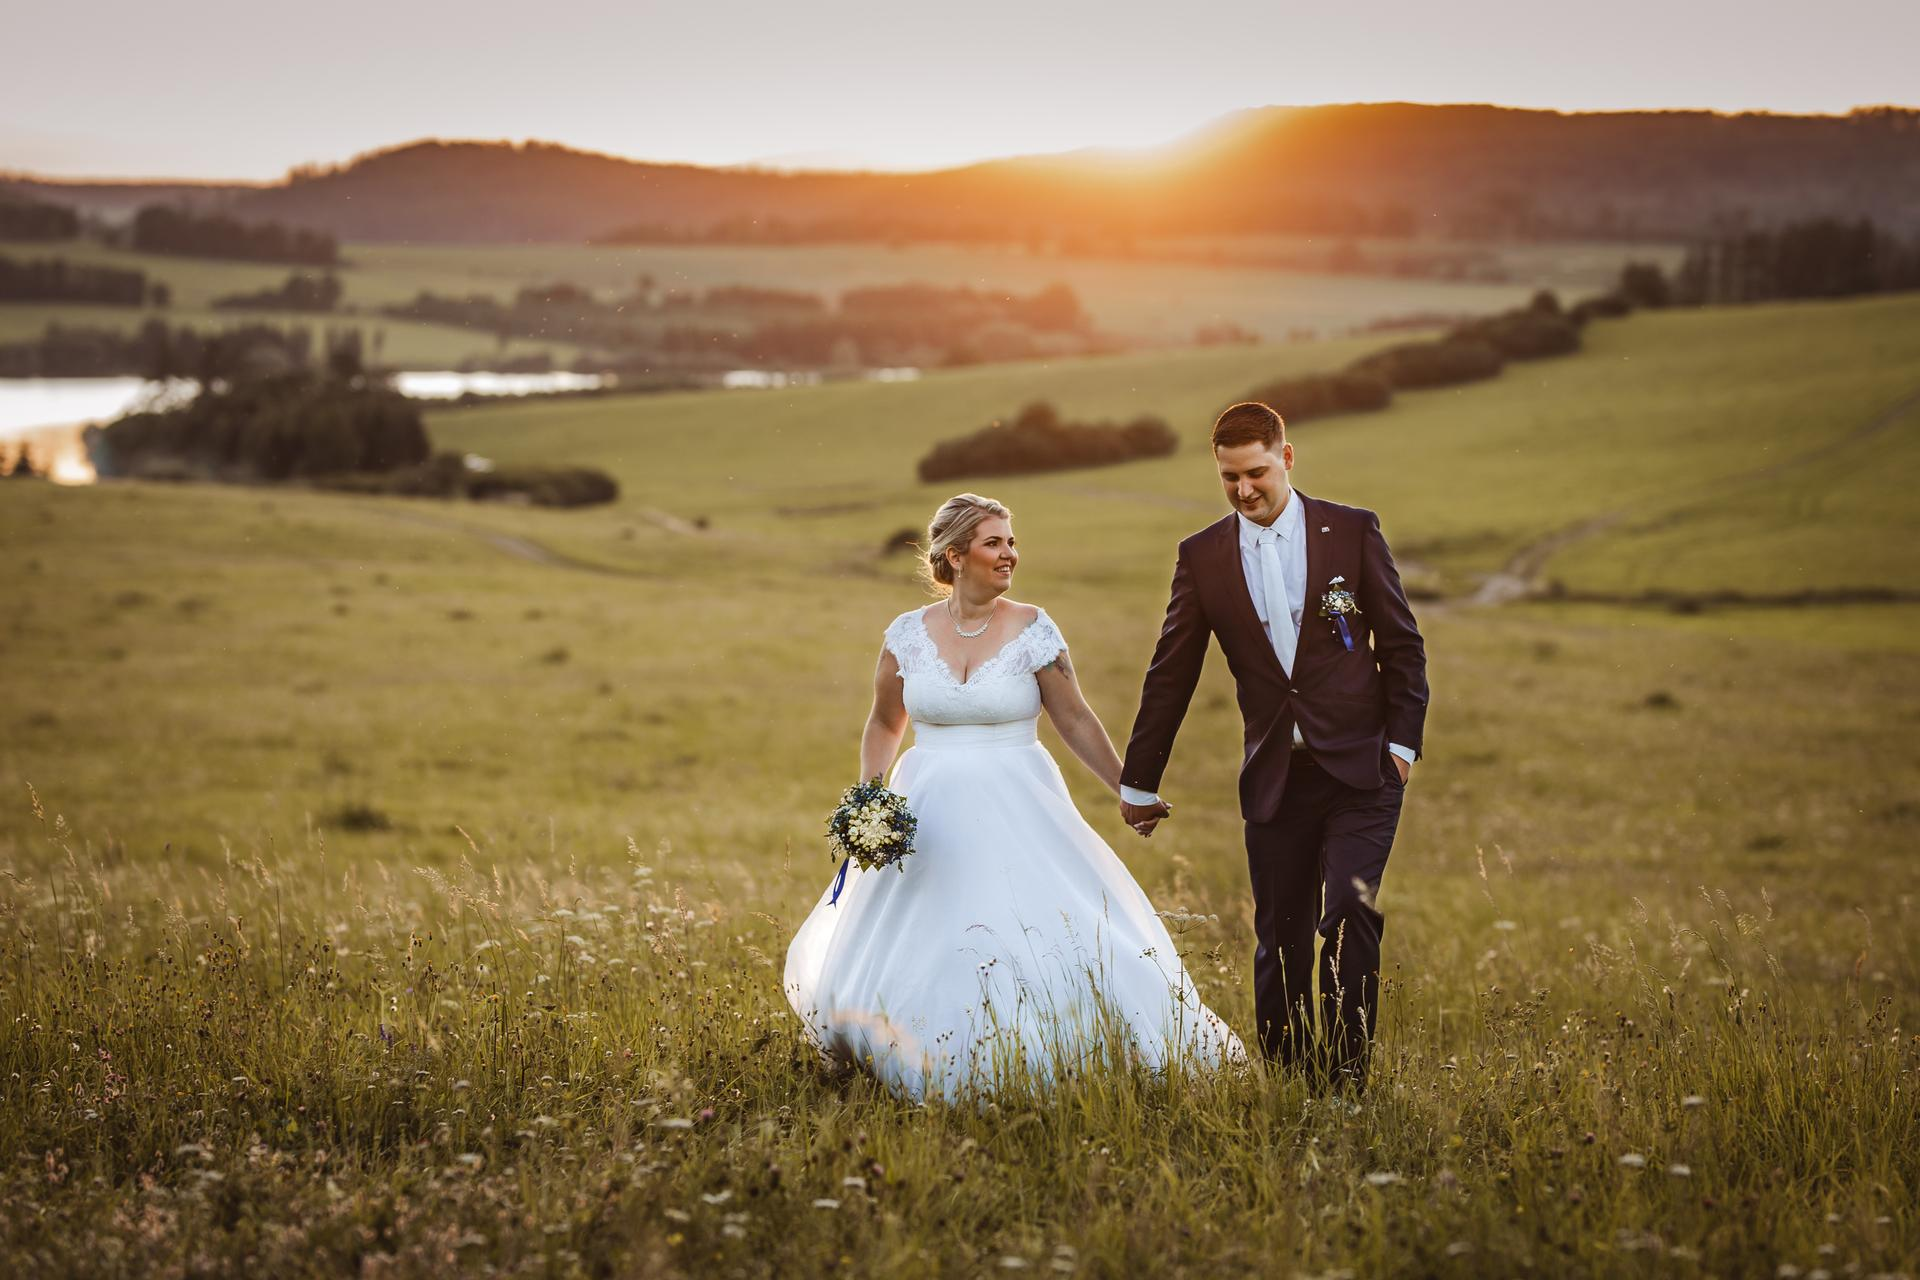 Sluníčko sluníčko...krásný západ slunce na svatbě u Slezské Harty  Stále mám volné termíny na rok 2021...pište/volejte si o ně 🙂, ráda za vámi přijedu po celé ČR. - Obrázek č. 2